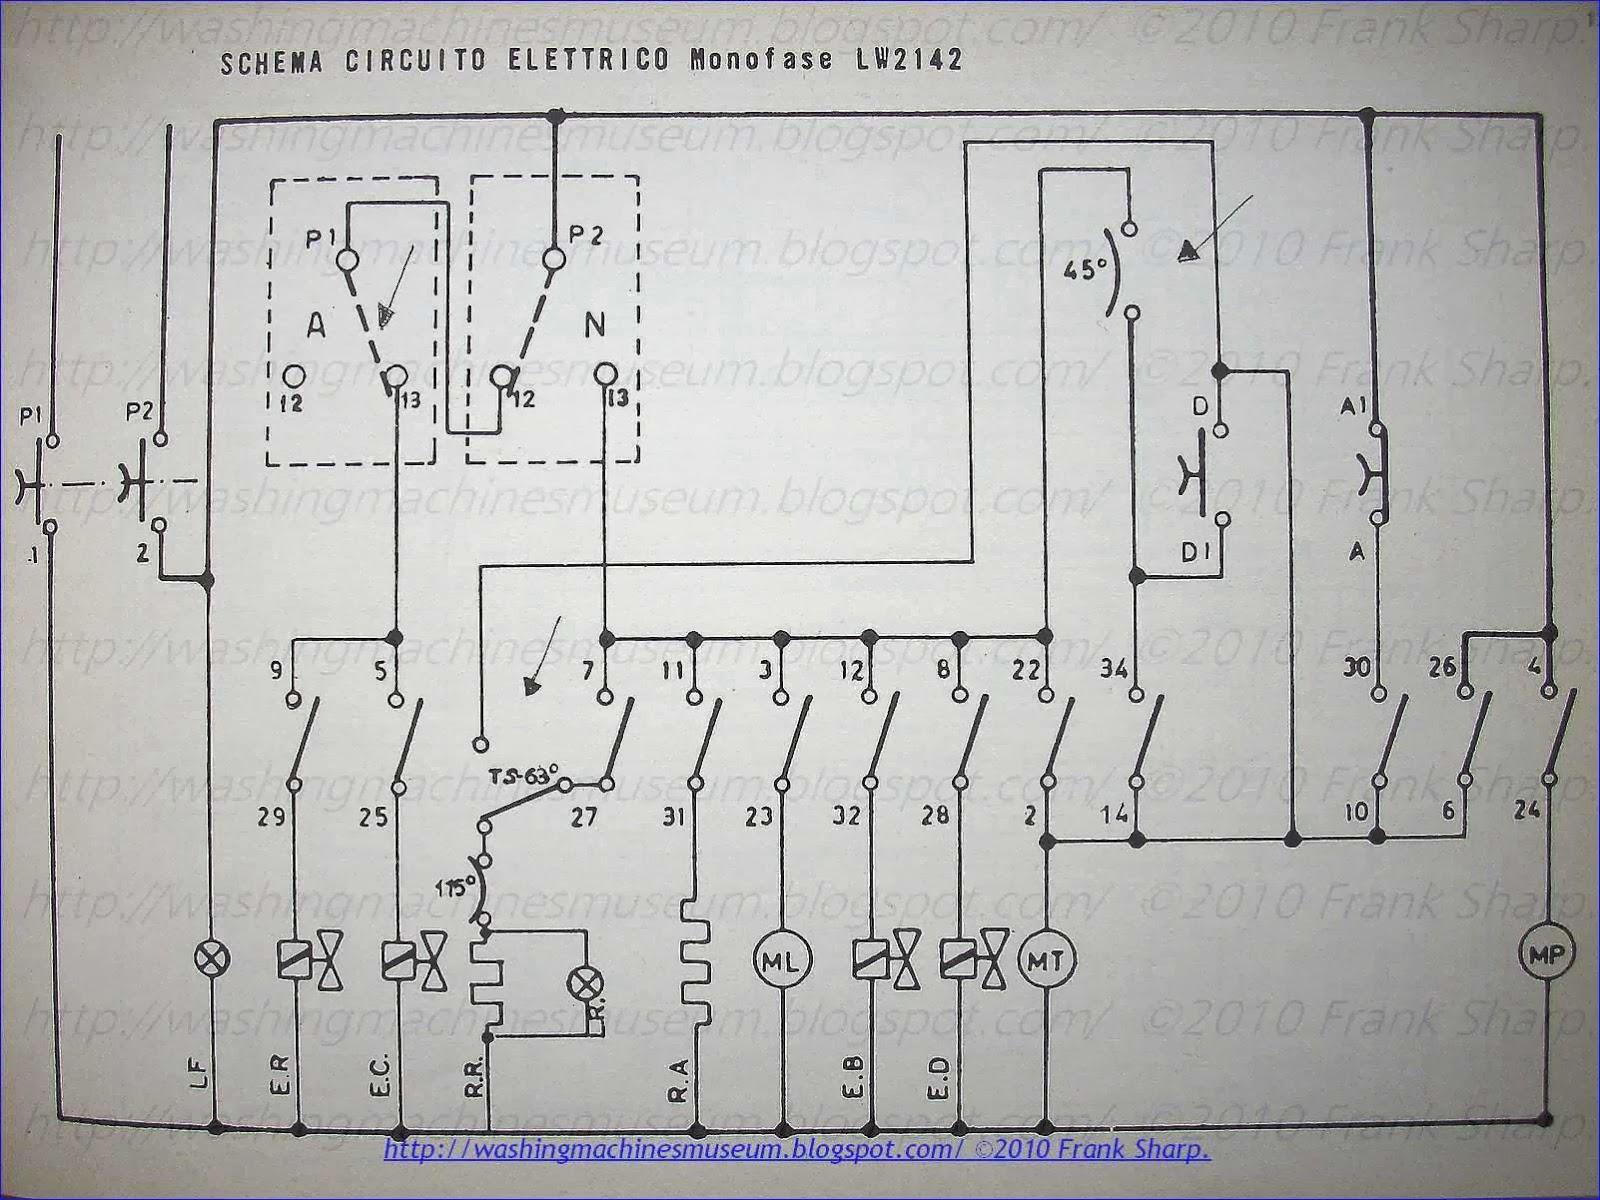 small resolution of wrg 4272 philco refrigerator wiring diagram philco lw2142 lw2142 a lw2142 b schematic diagram